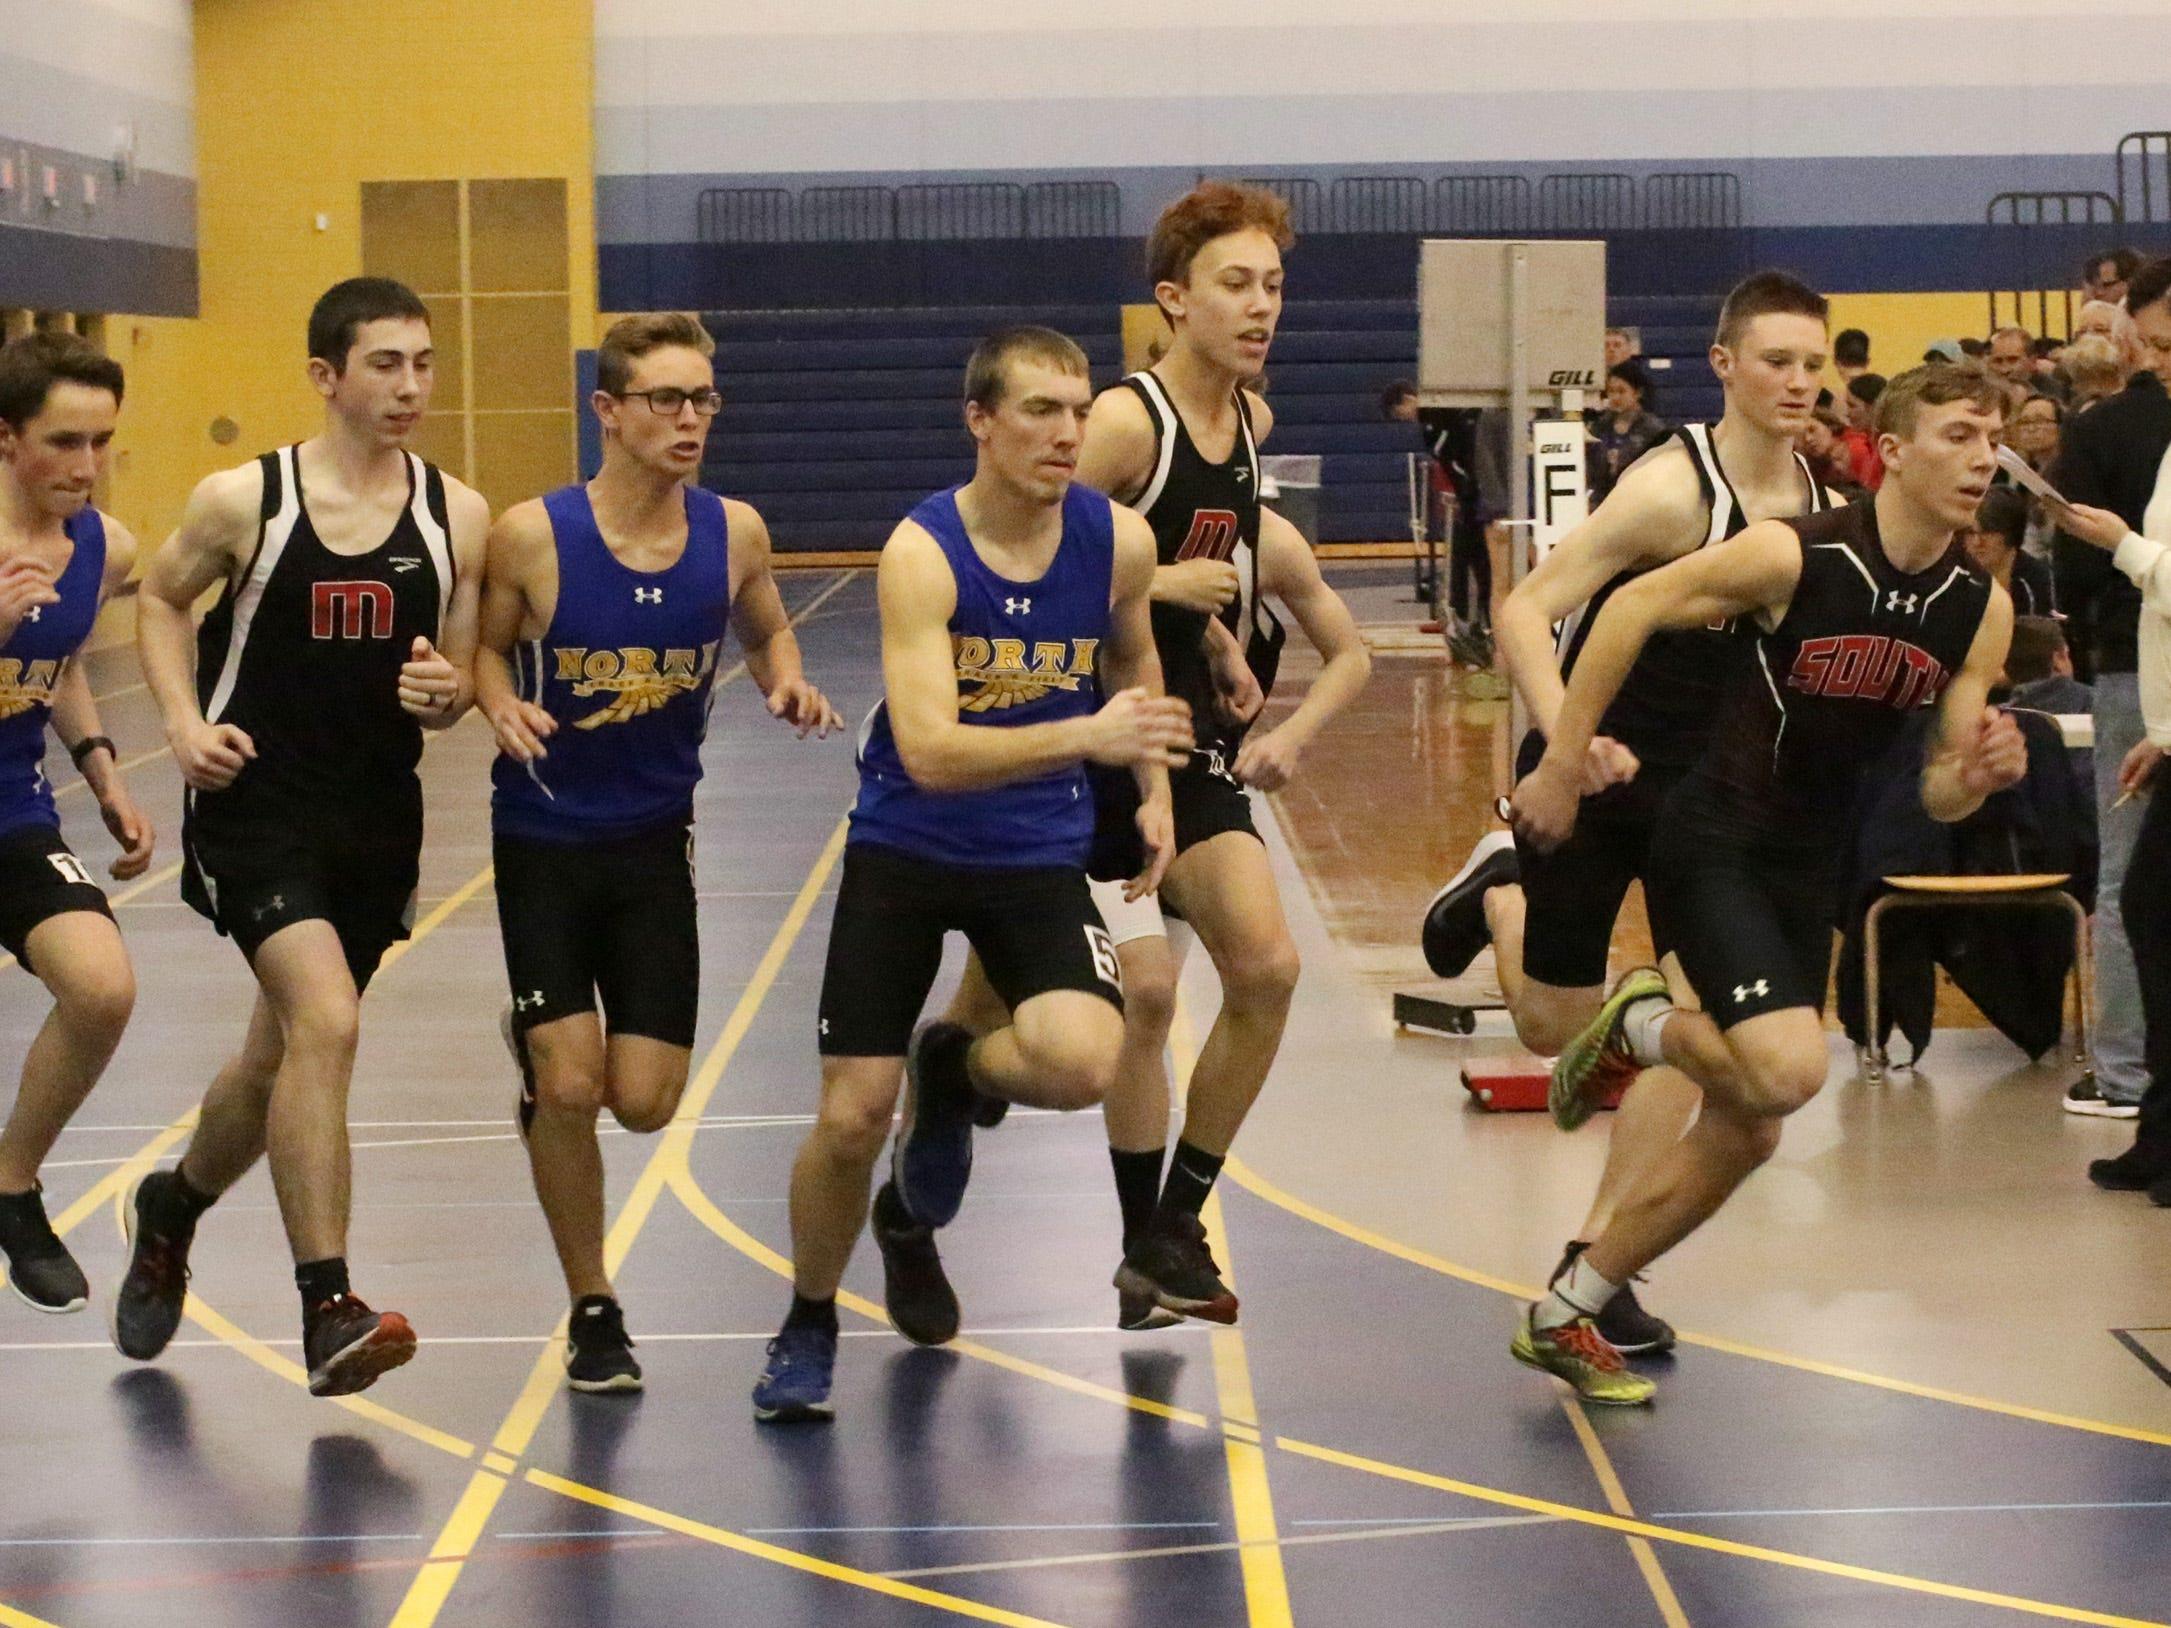 Boys start the 1600 at the Sheboygan North Invite track meet, Tuesday, April 2, 2019, in Sheboygan, Wis.